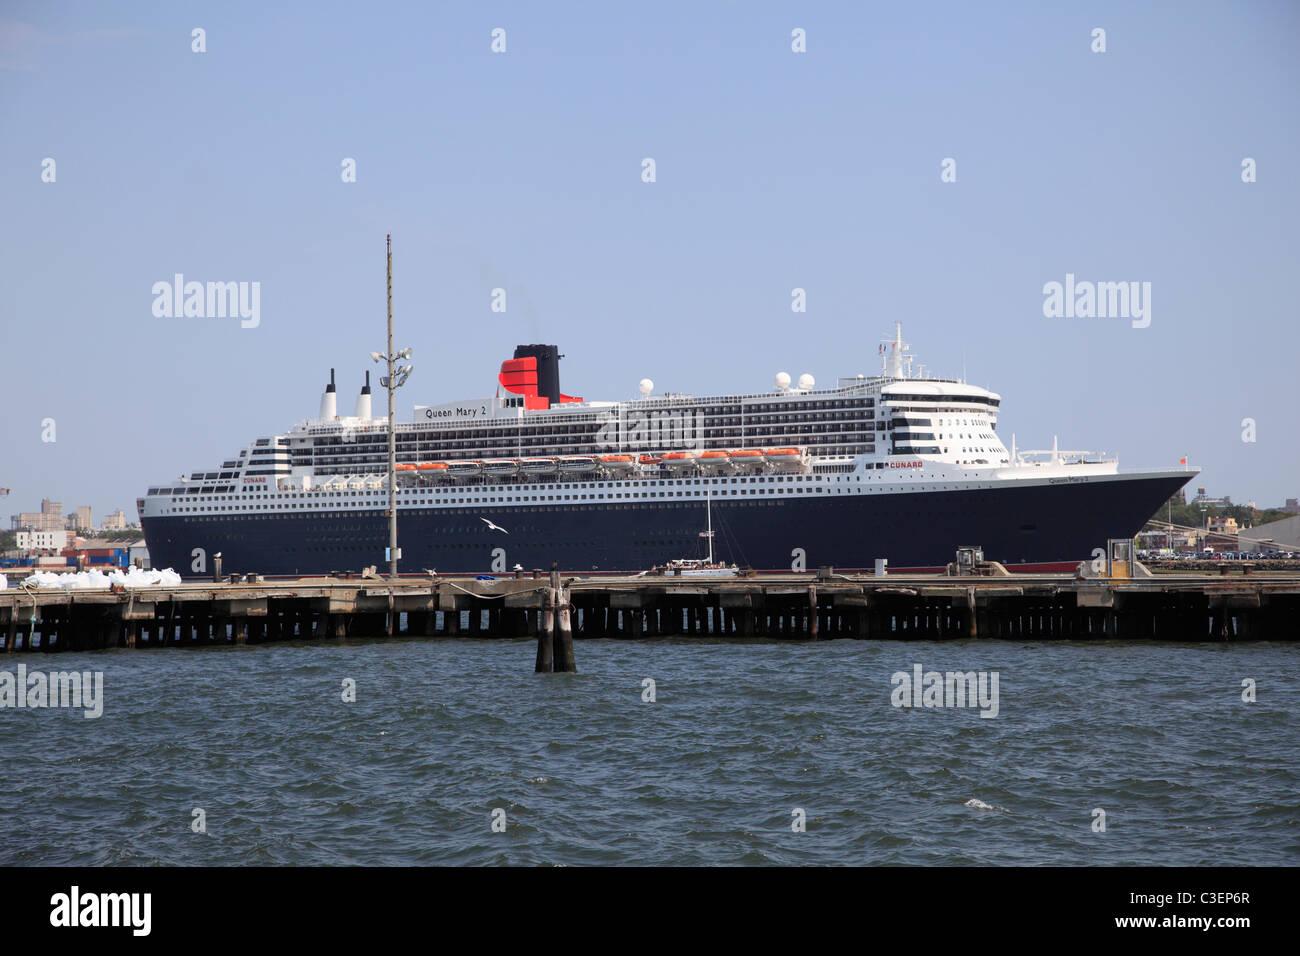 Qm2 Cruise Liner Stock Photos Amp Qm2 Cruise Liner Stock